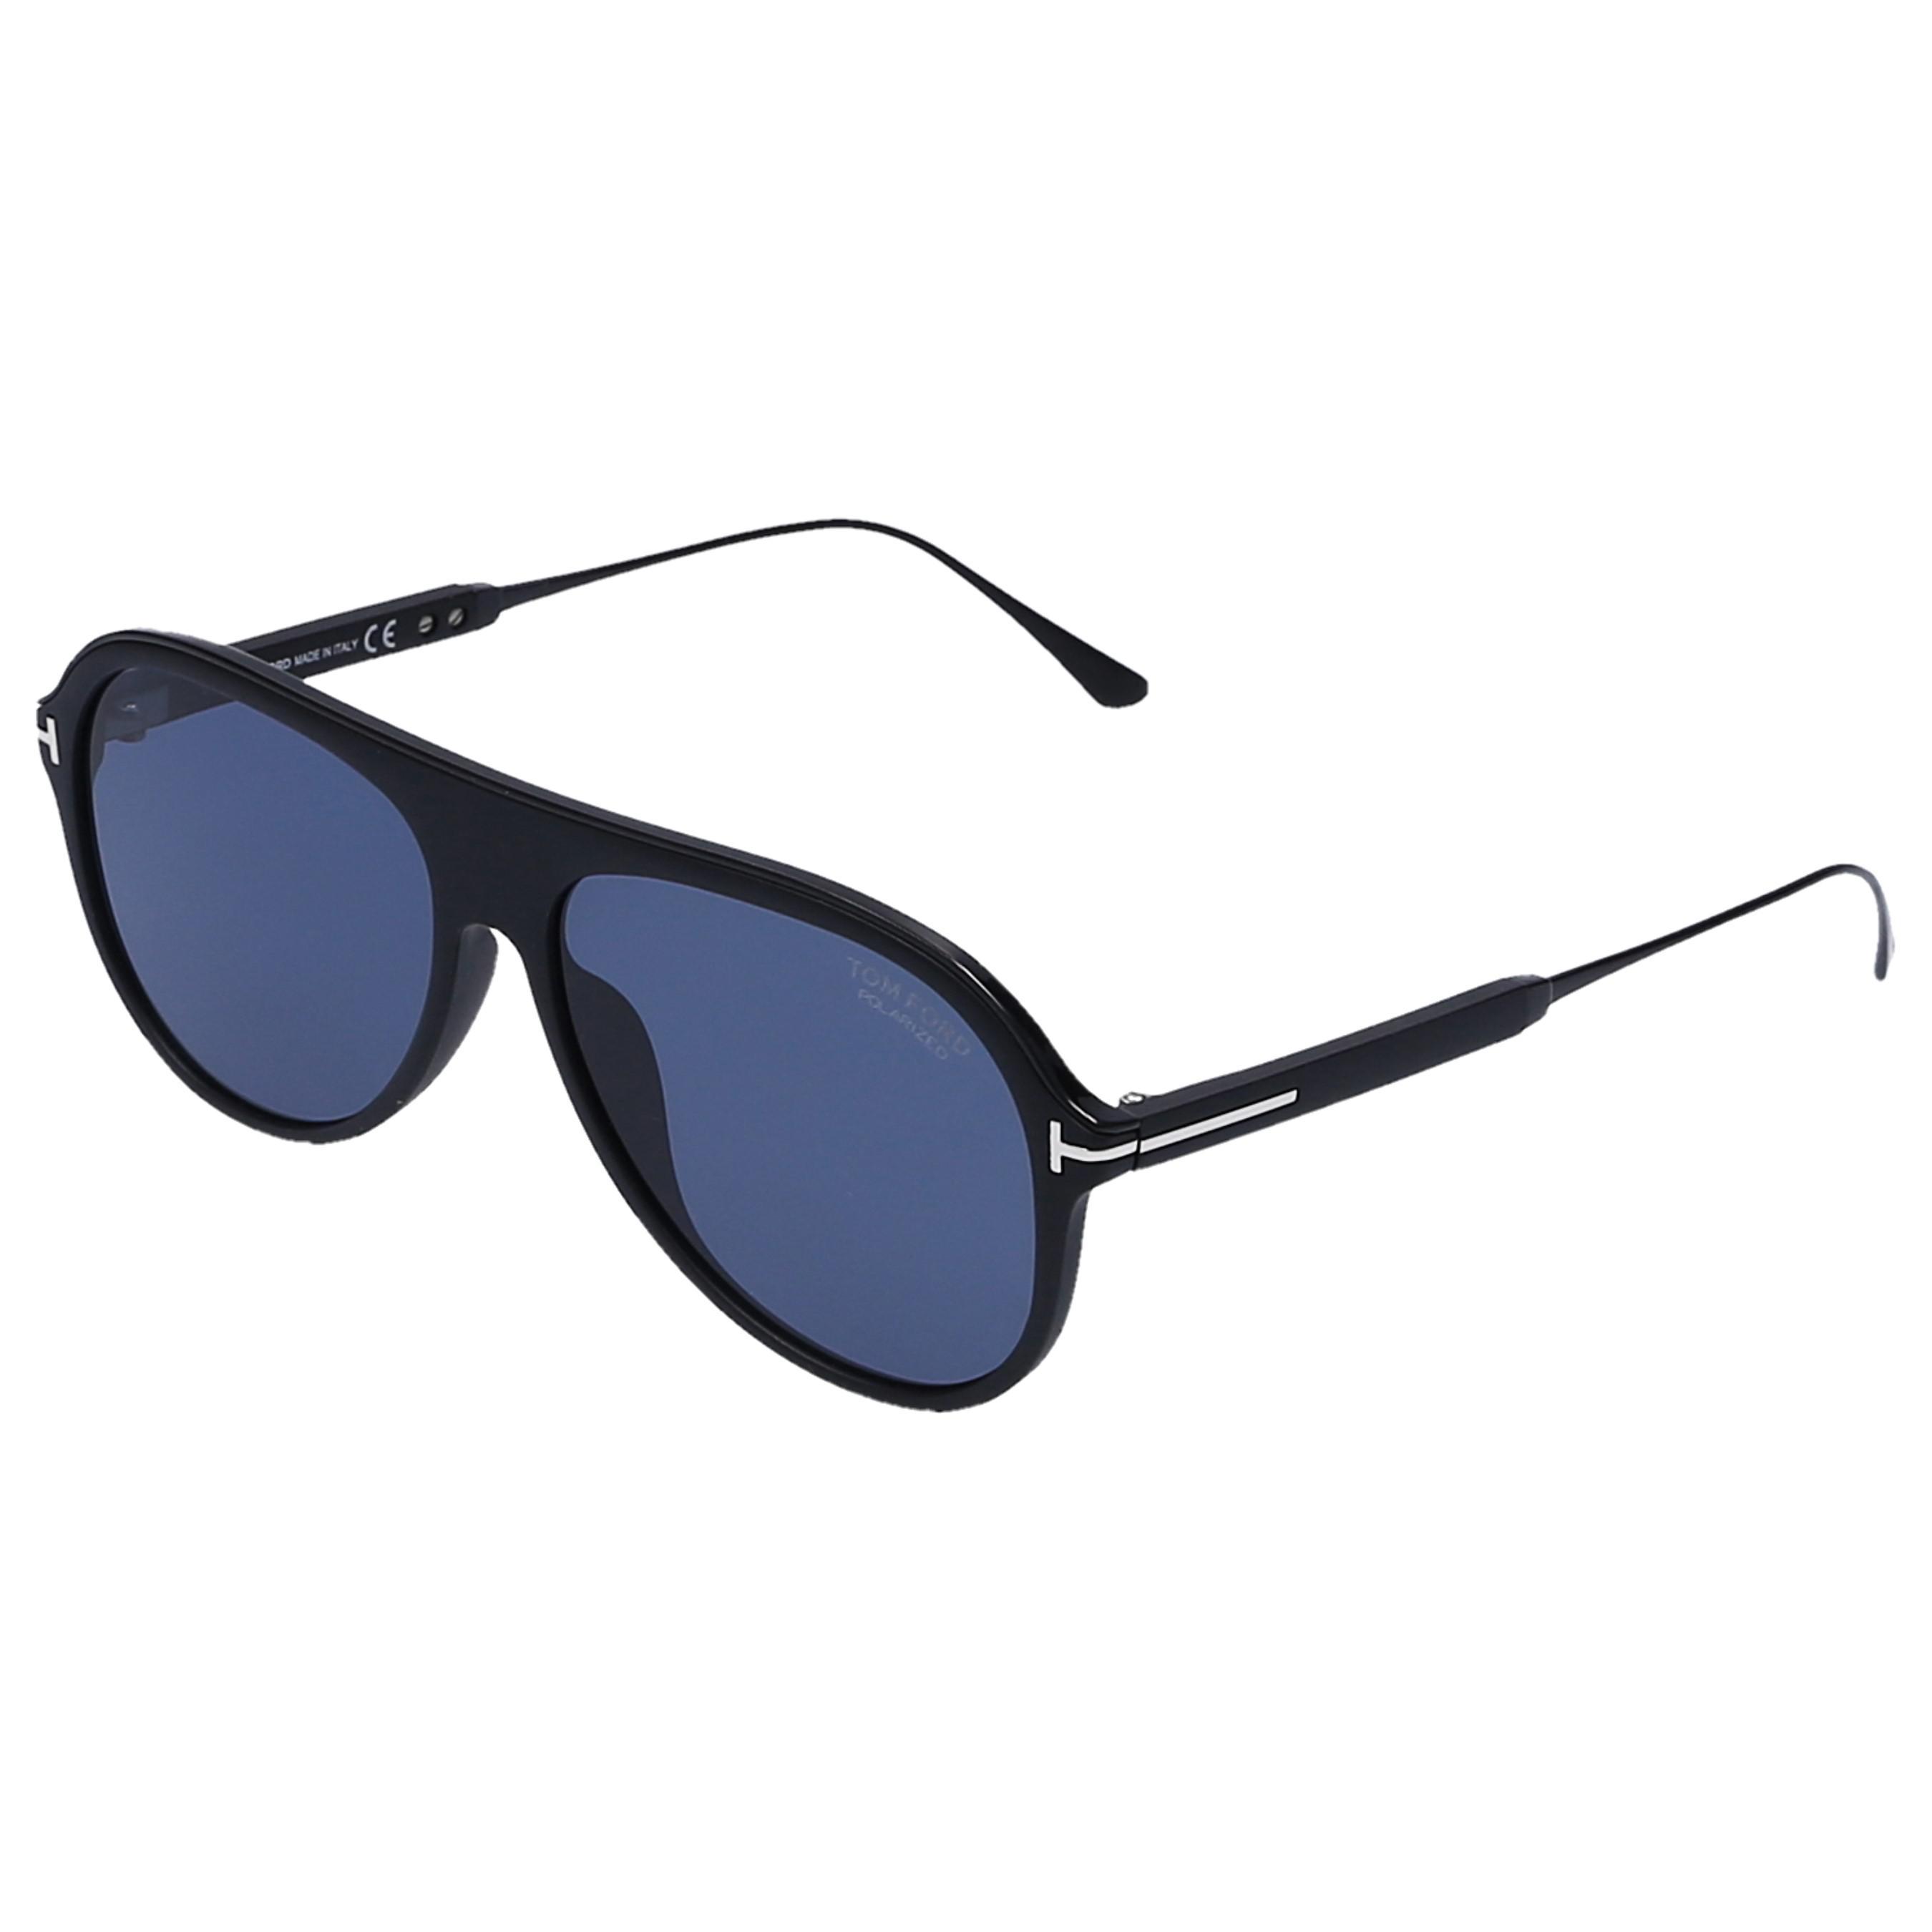 8d901f09b22e6 Lyst - Tom Ford Unisex Sunglasses Aviator 624 Acetate Black in Blue ...